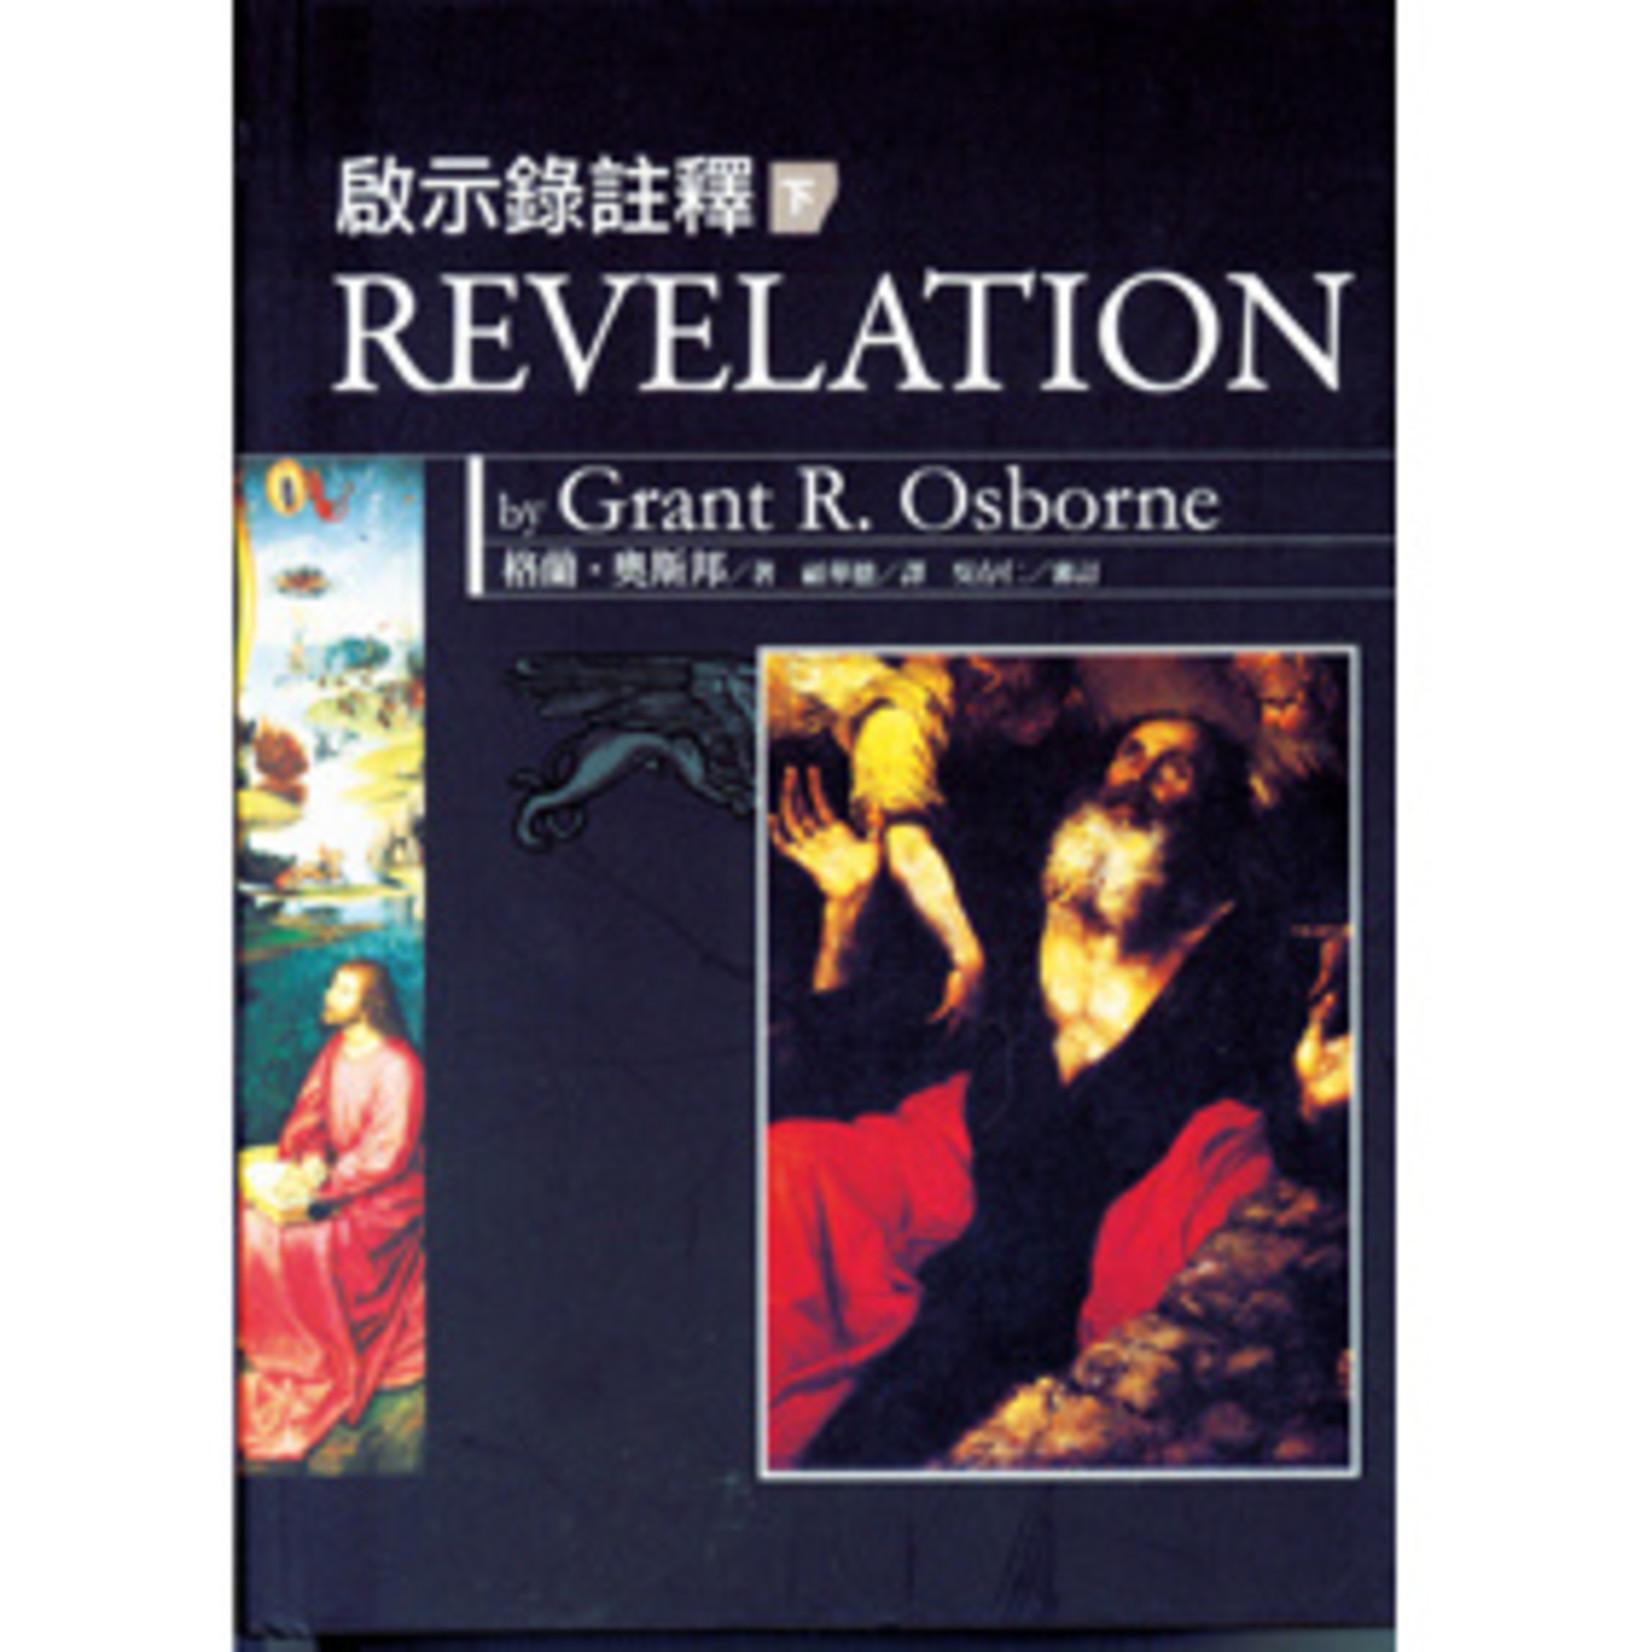 中華福音神學院 China Evangelical Seminary 啟示錄註釋(下) Revelation (vol. 2)